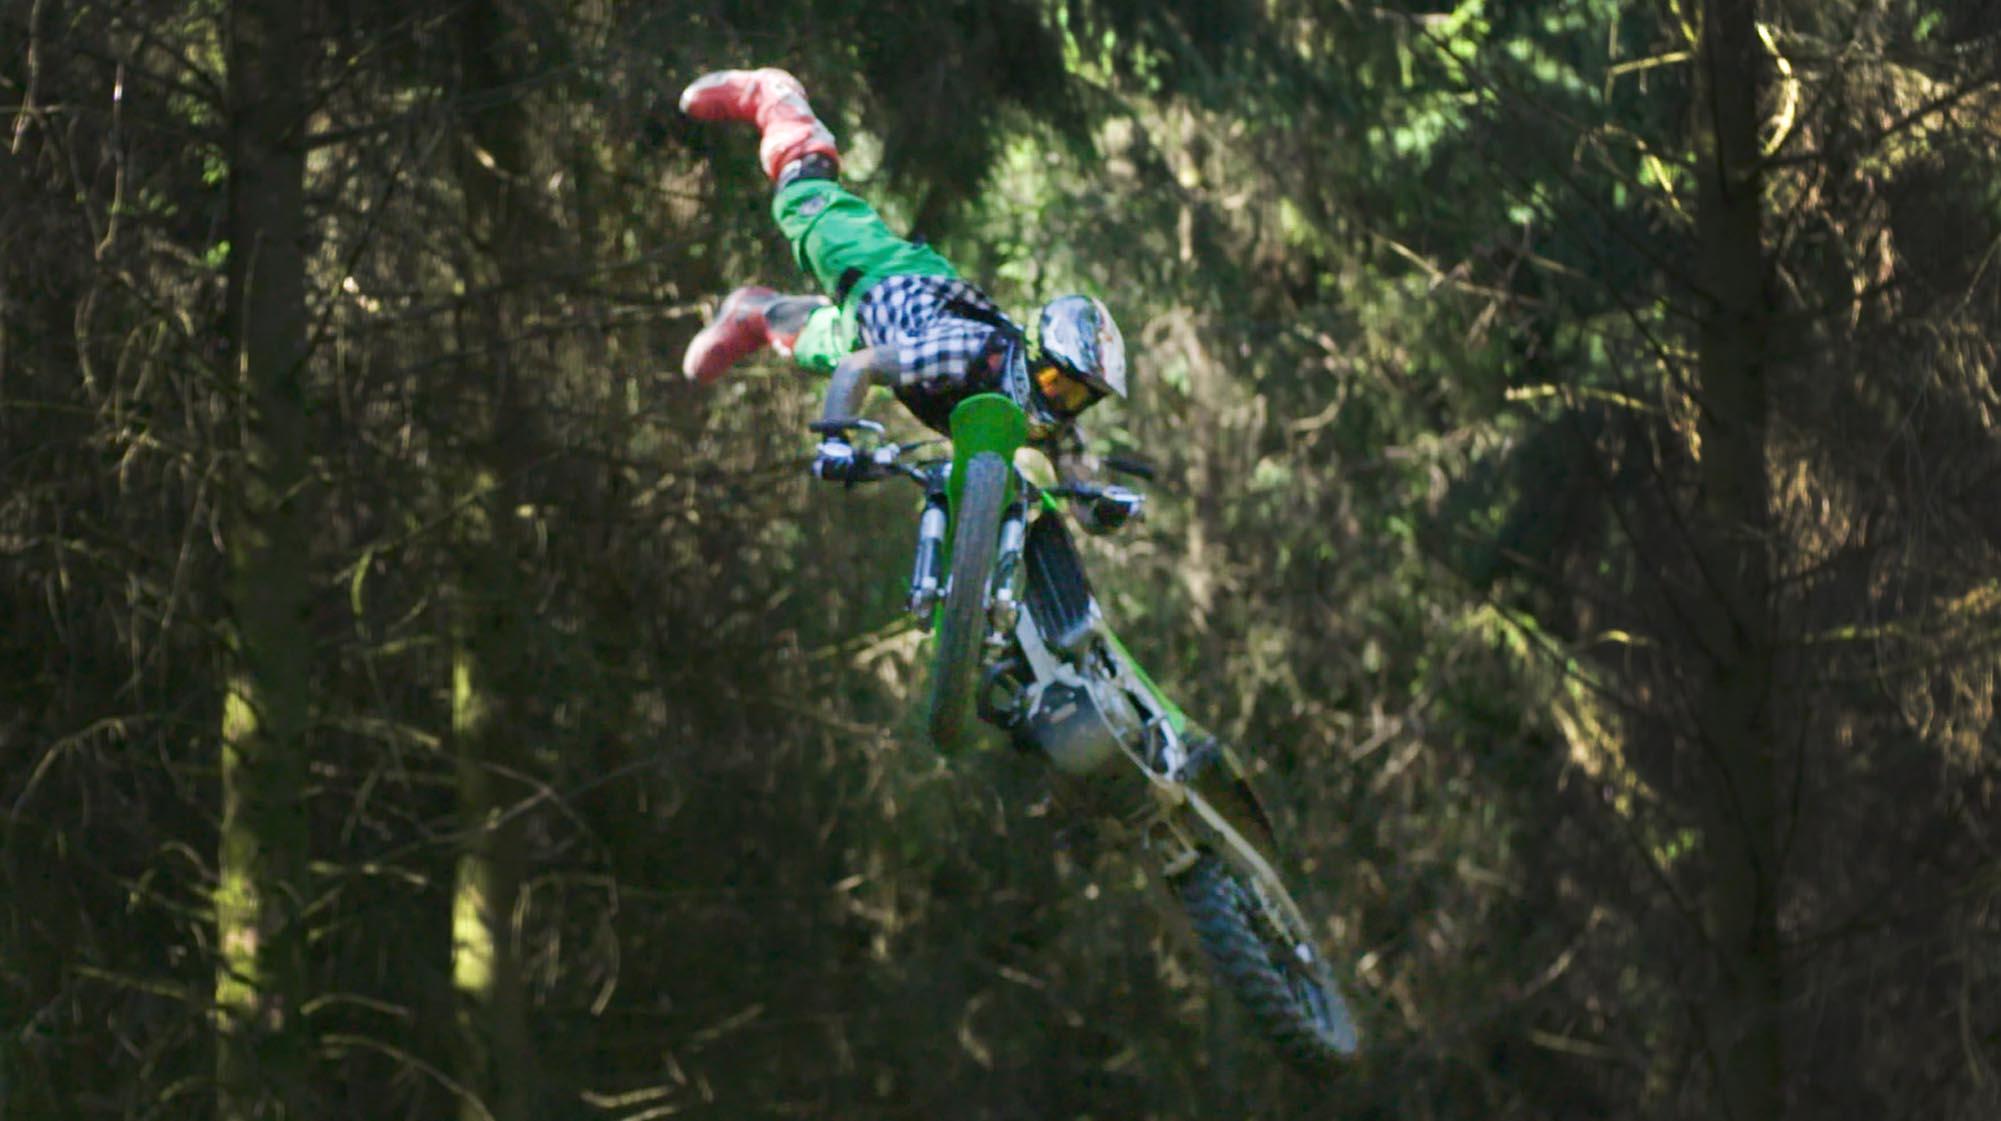 FMX Rider Wayne Jacobs